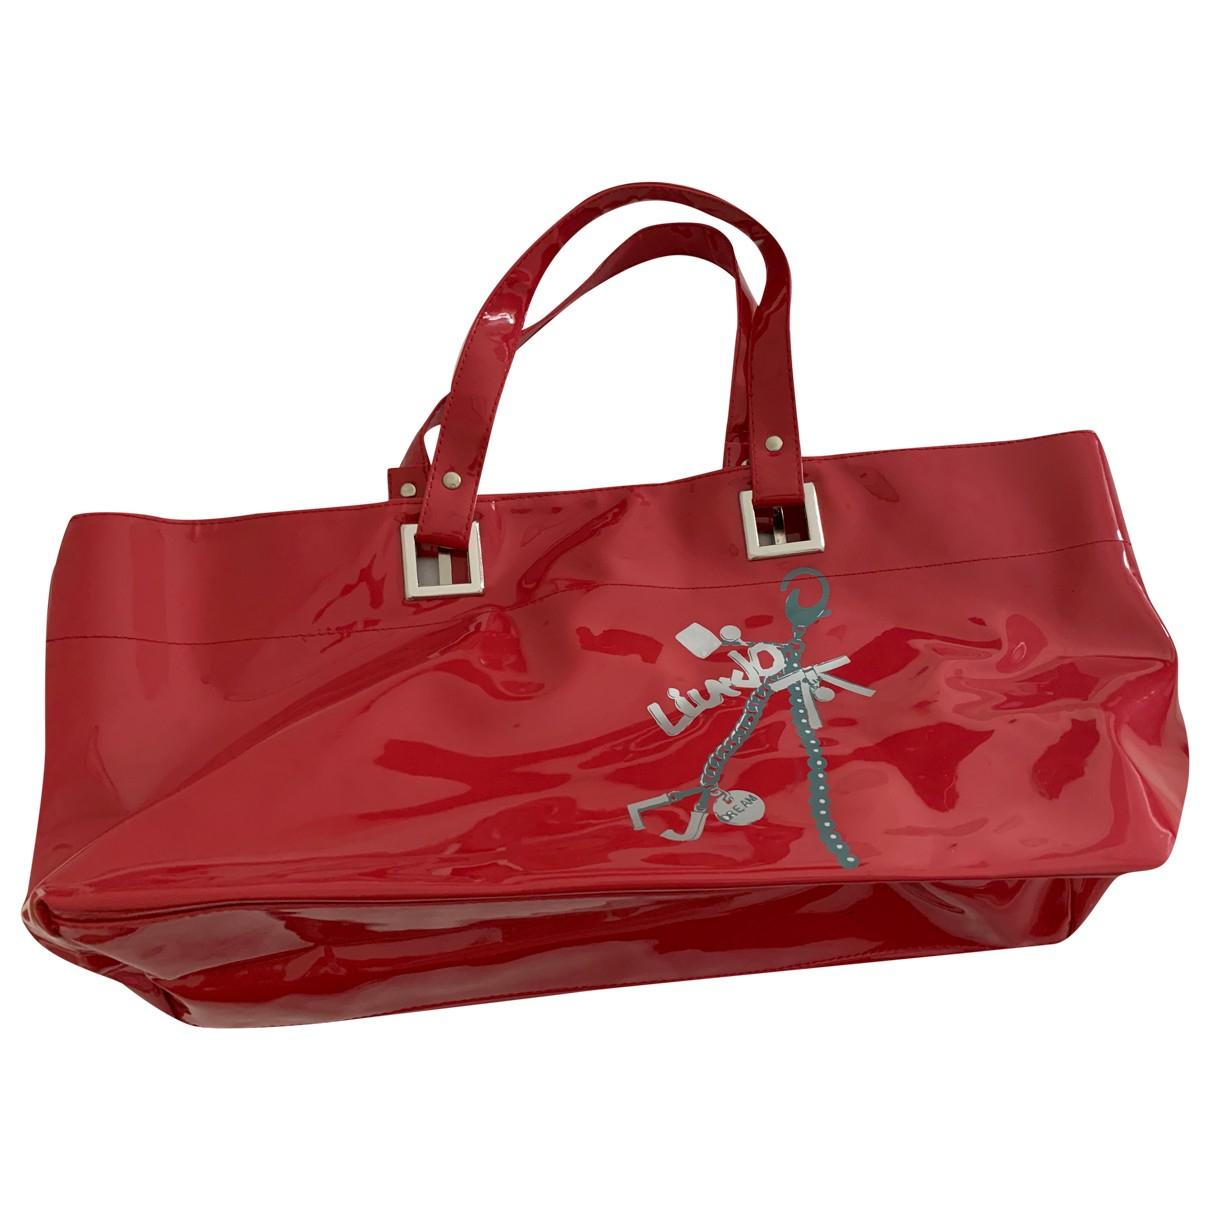 Liu.jo N Purple Patent leather handbag for Women N